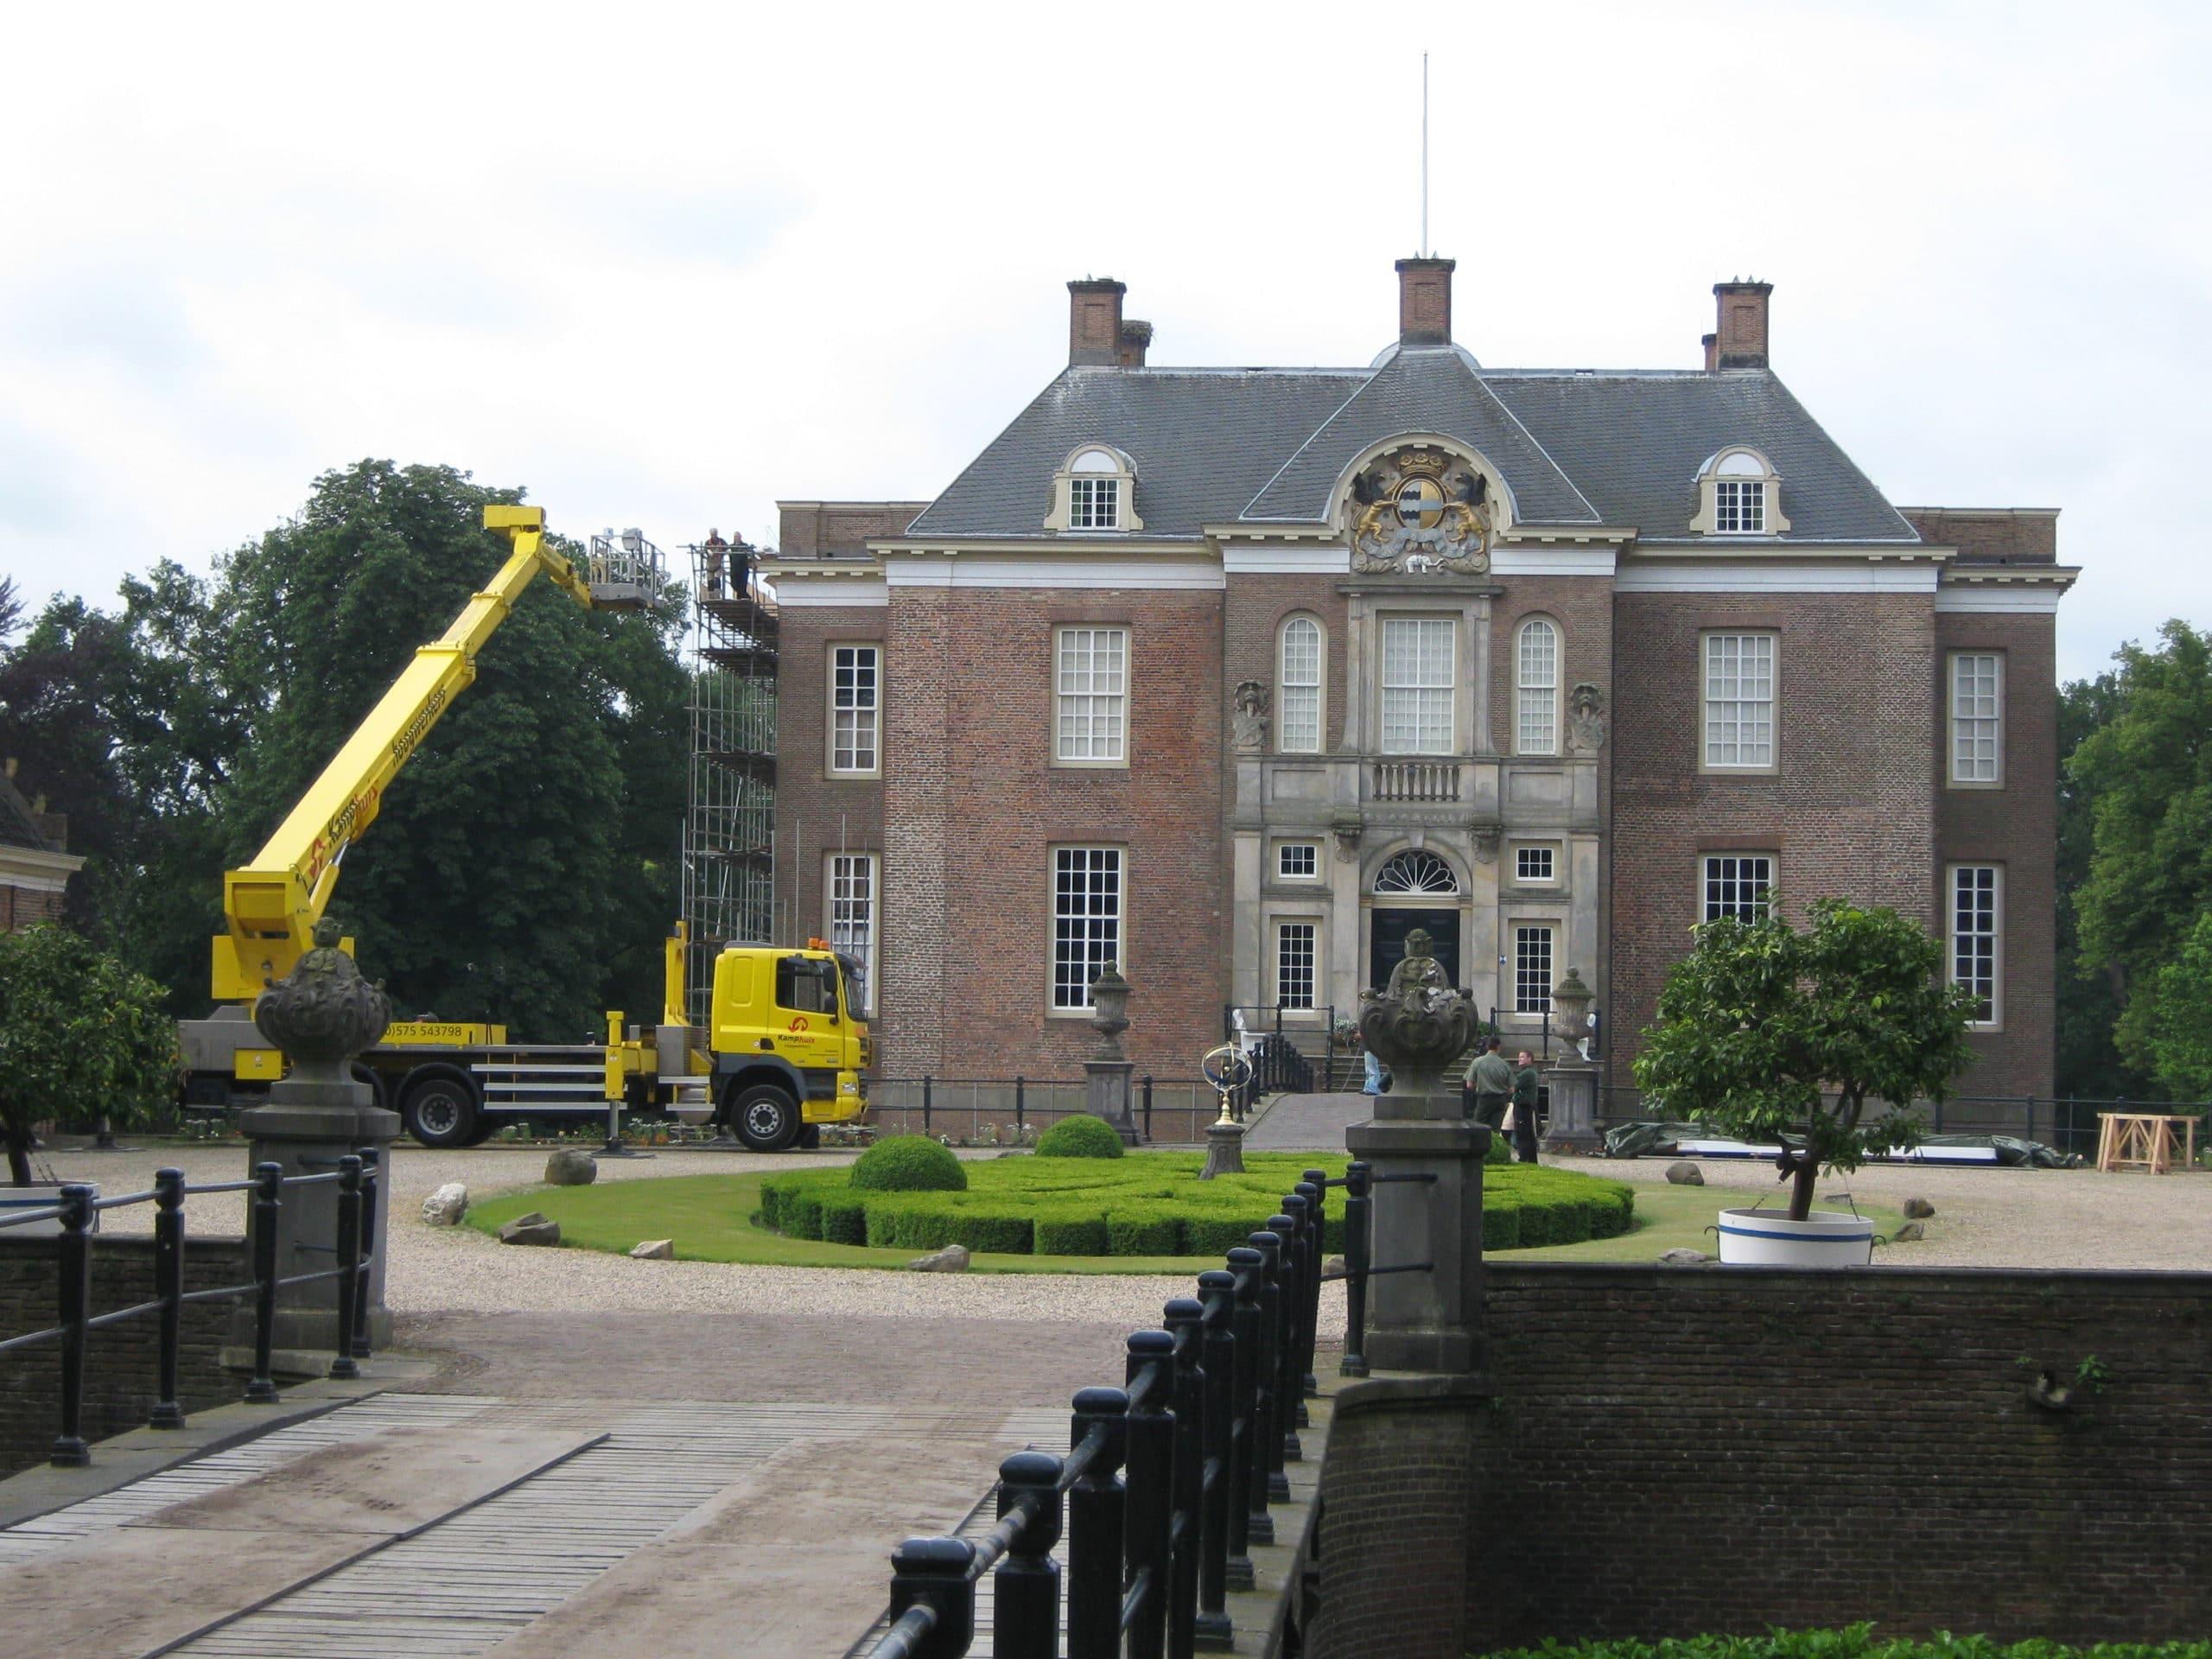 kasteel Middachten (13)